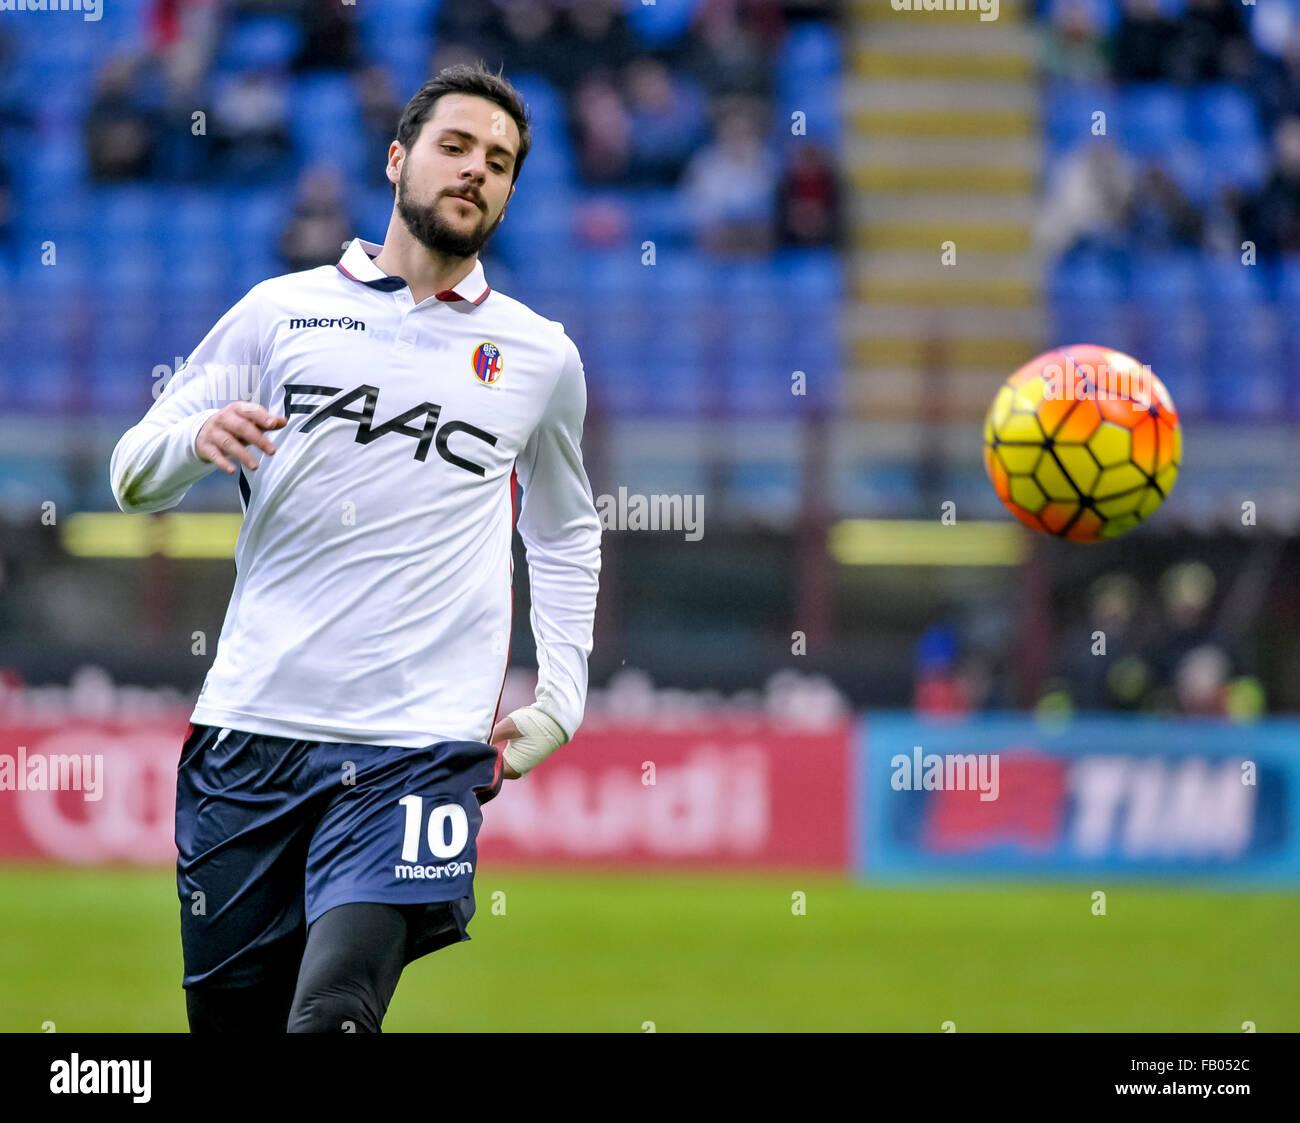 Milan Italy 06th Jan 2016 Mattia Destro In Action During The Stock Photo Alamy